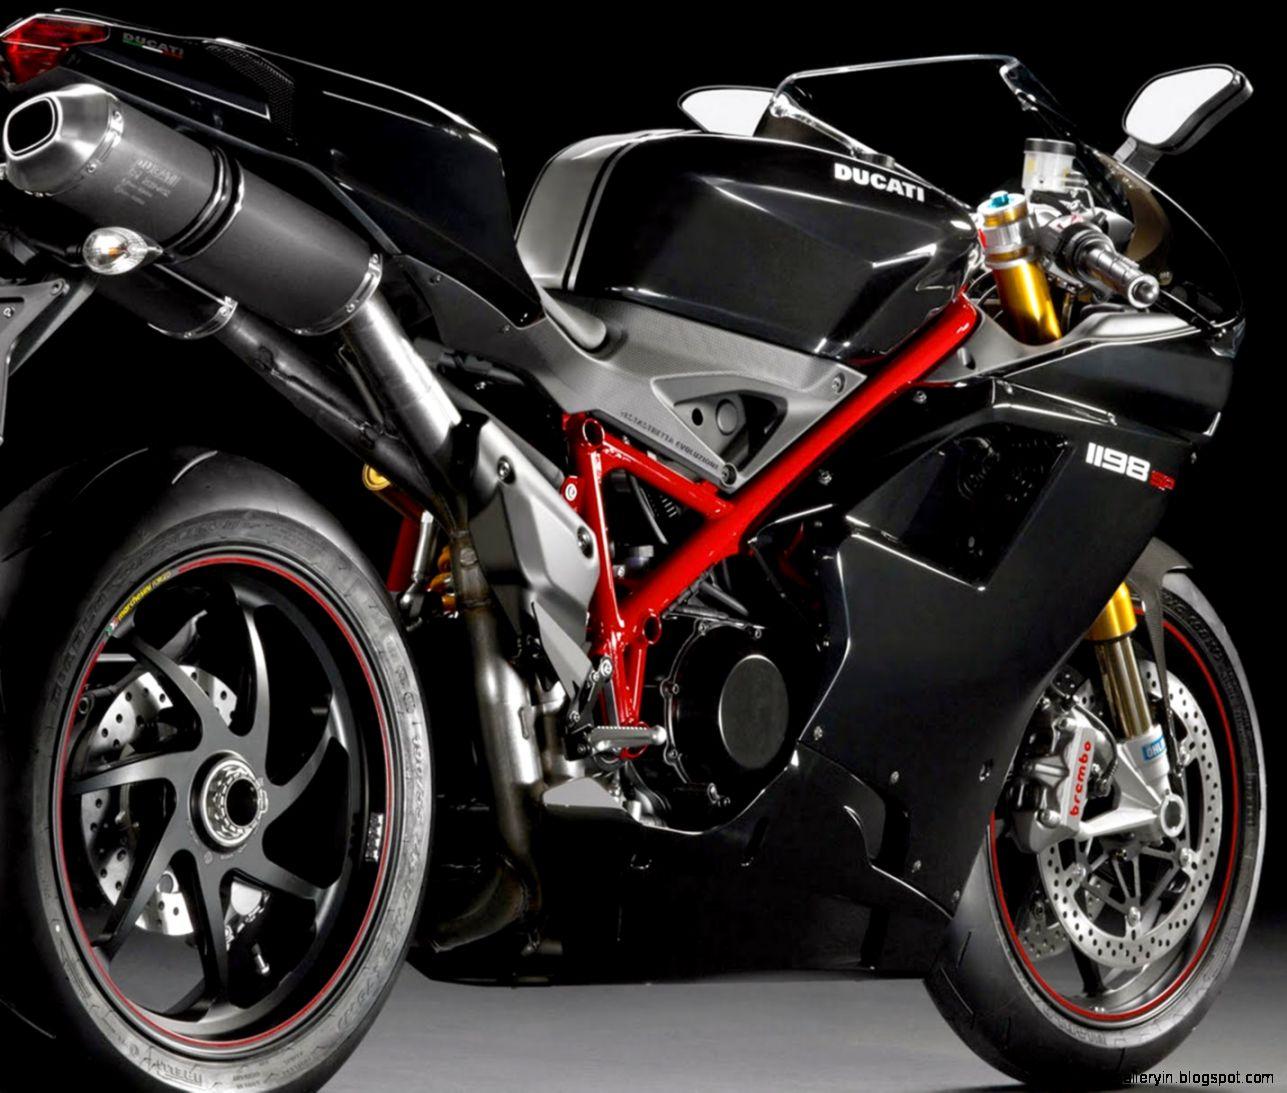 Superbike Ducati 1198 SP Rear View Wallpaper D 13912 Wallpaper